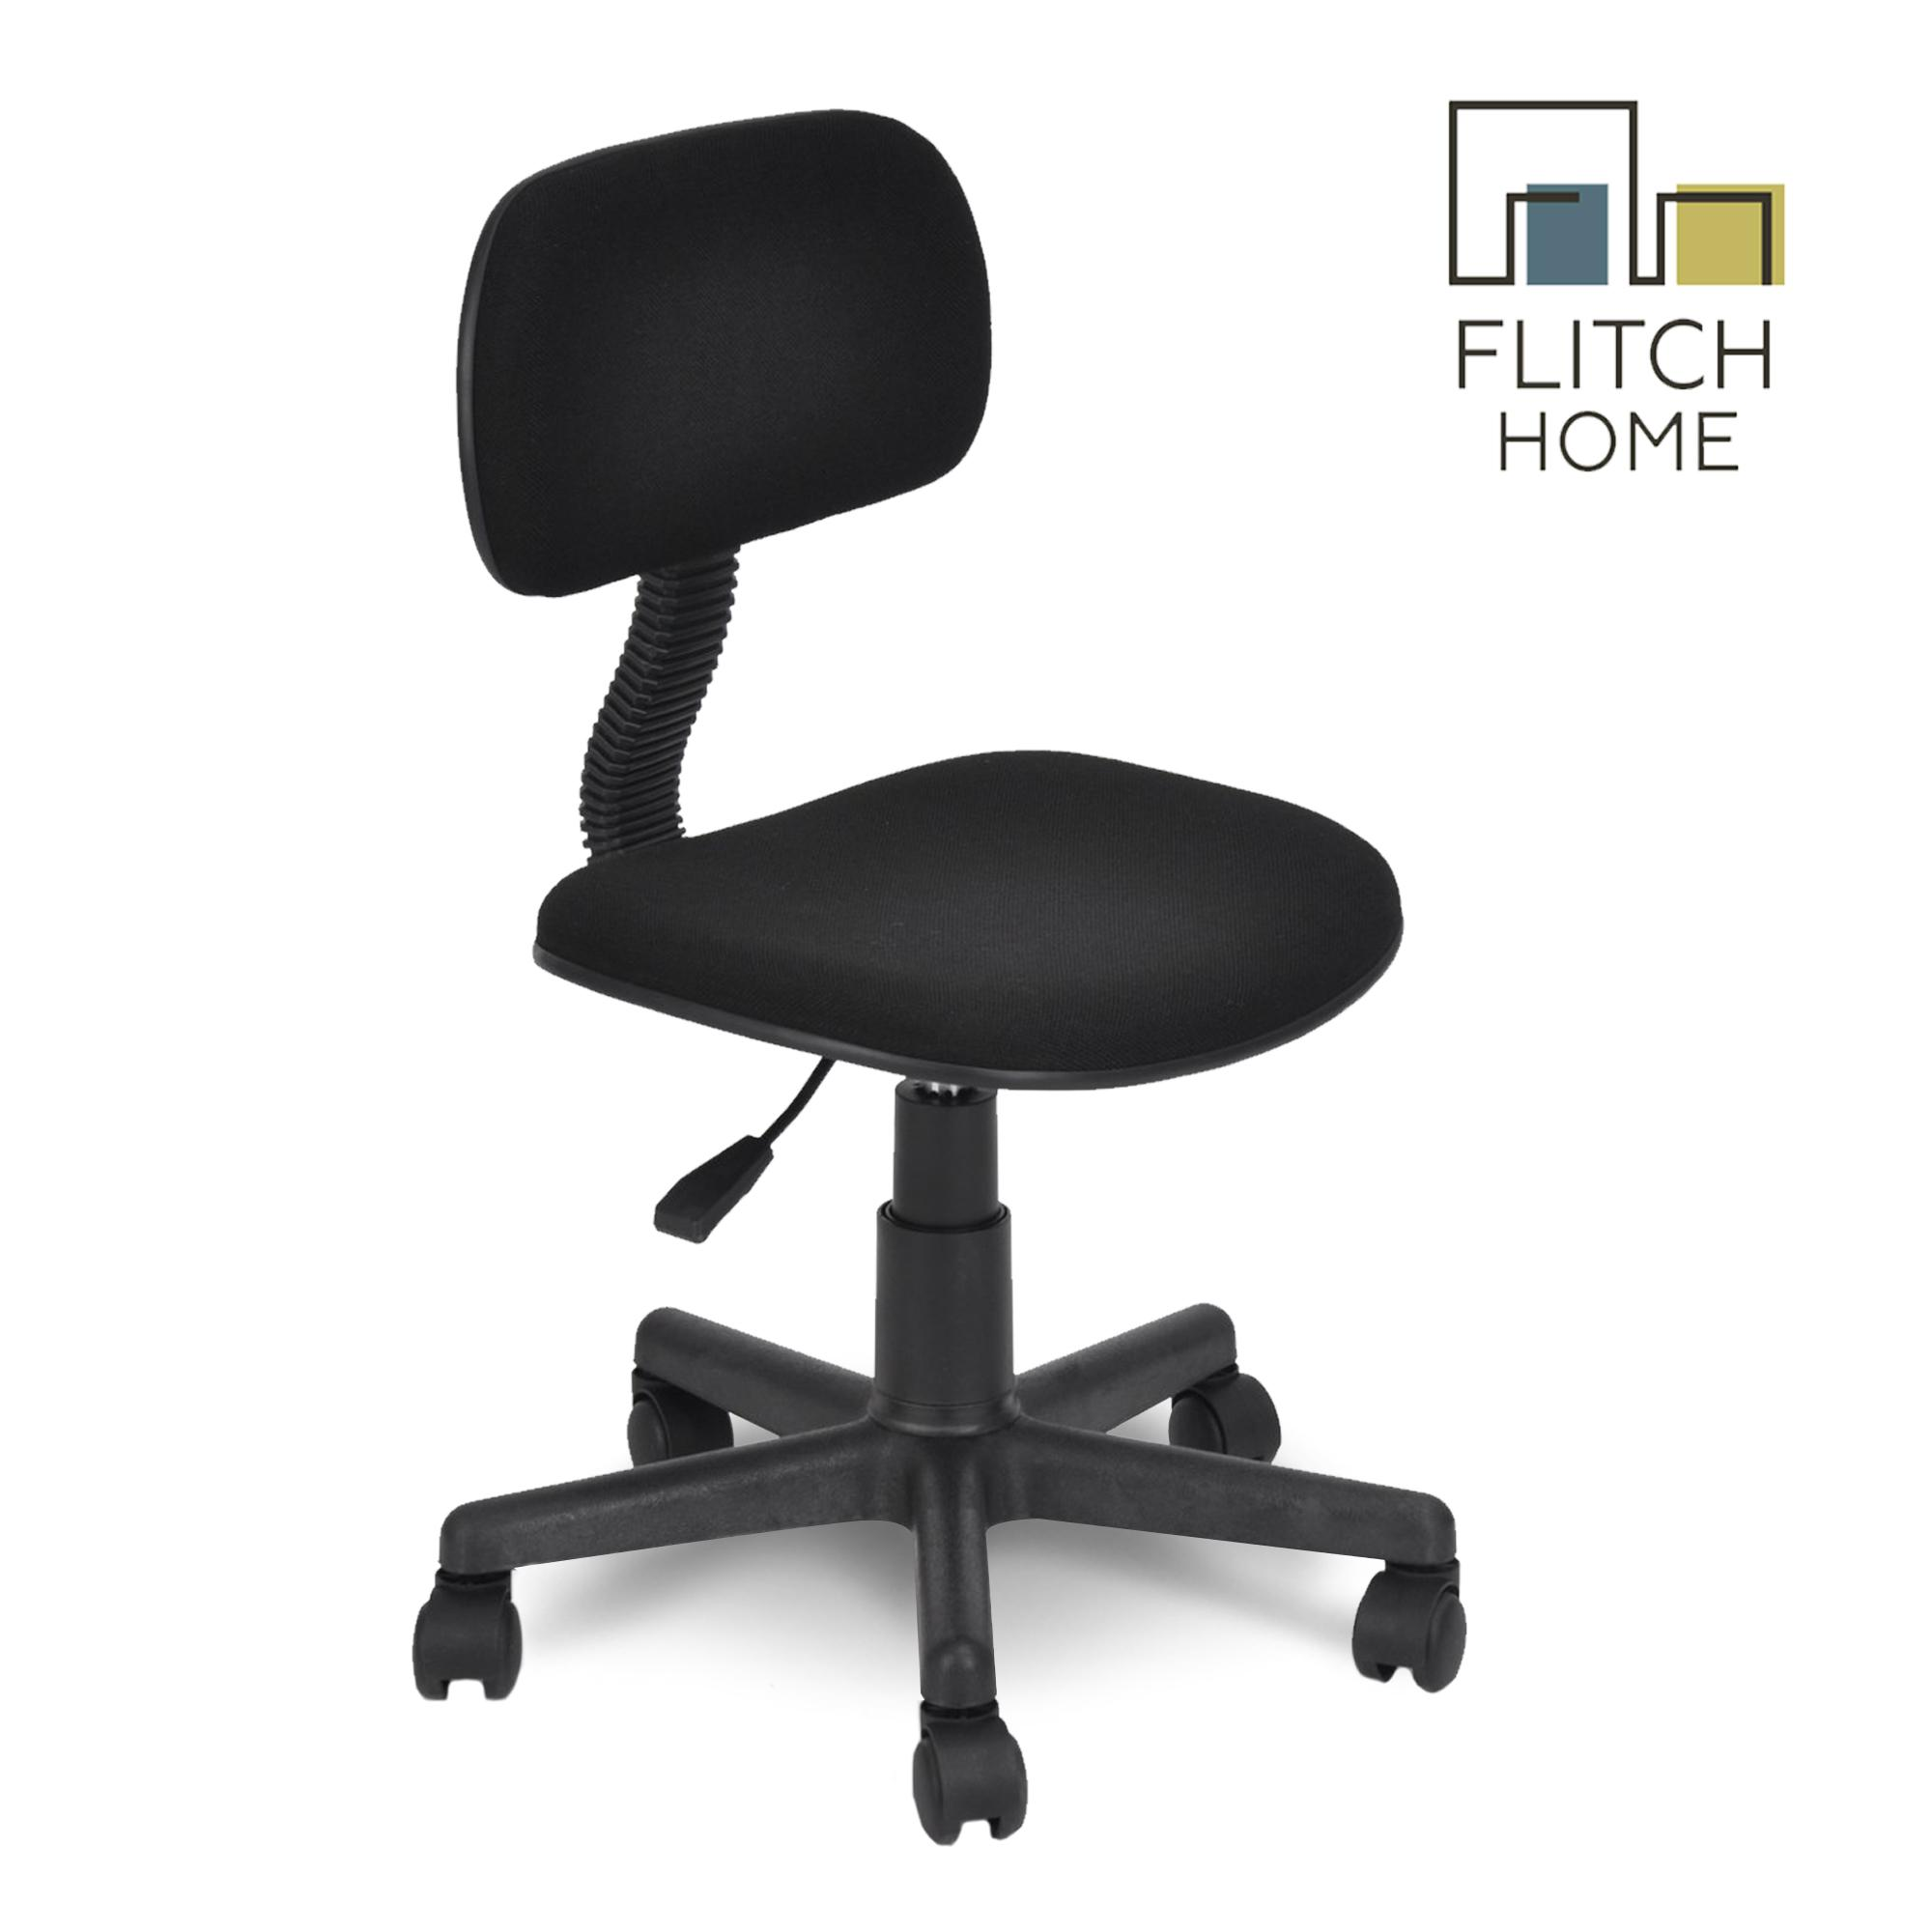 Pleasant Flitch Home Fh 120 Office Staff Chair Black Interior Design Ideas Clesiryabchikinfo